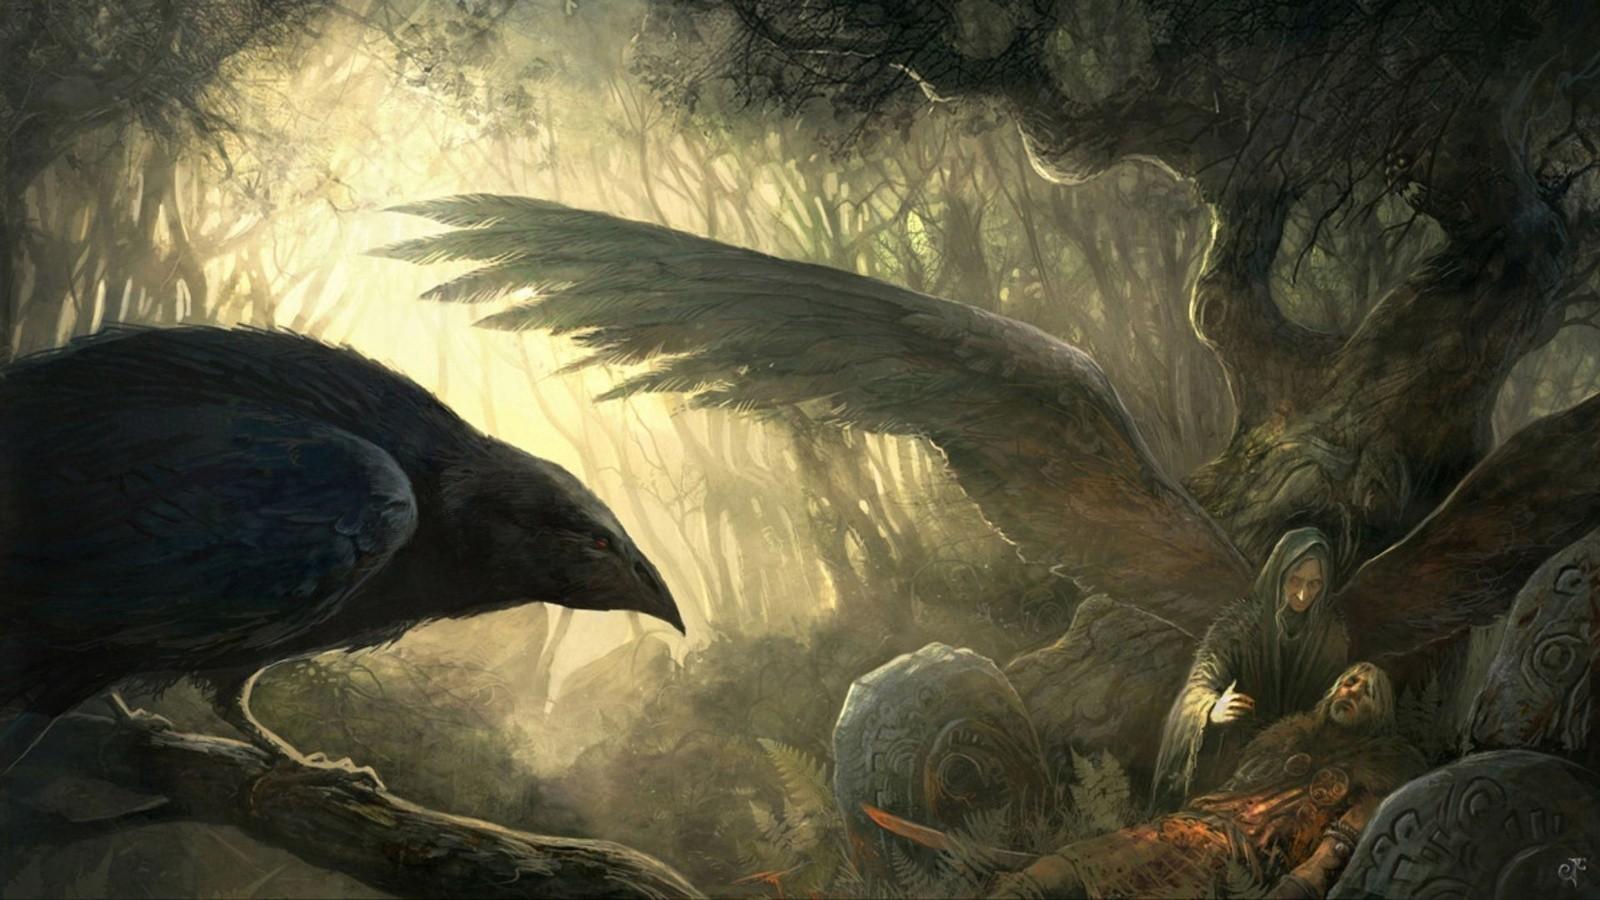 Masaustu Boyama Kanatlar Vikingler Karga Mitoloji Karanlik